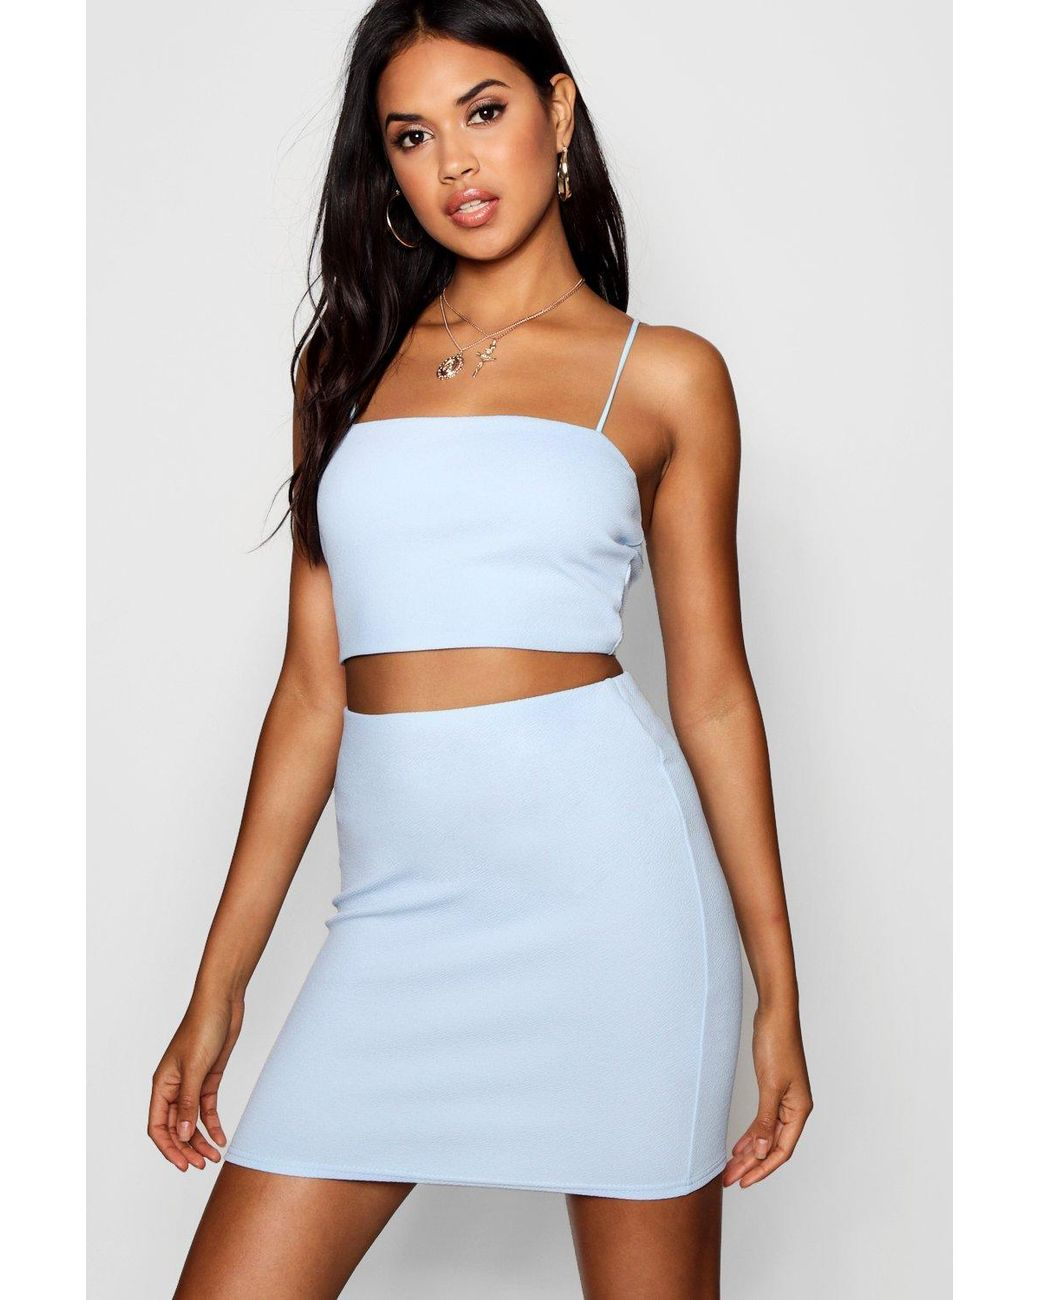 ca92ef71ea52 Boohoo Strappy Crop & Mini Skirt Co-ord Set in Blue - Lyst